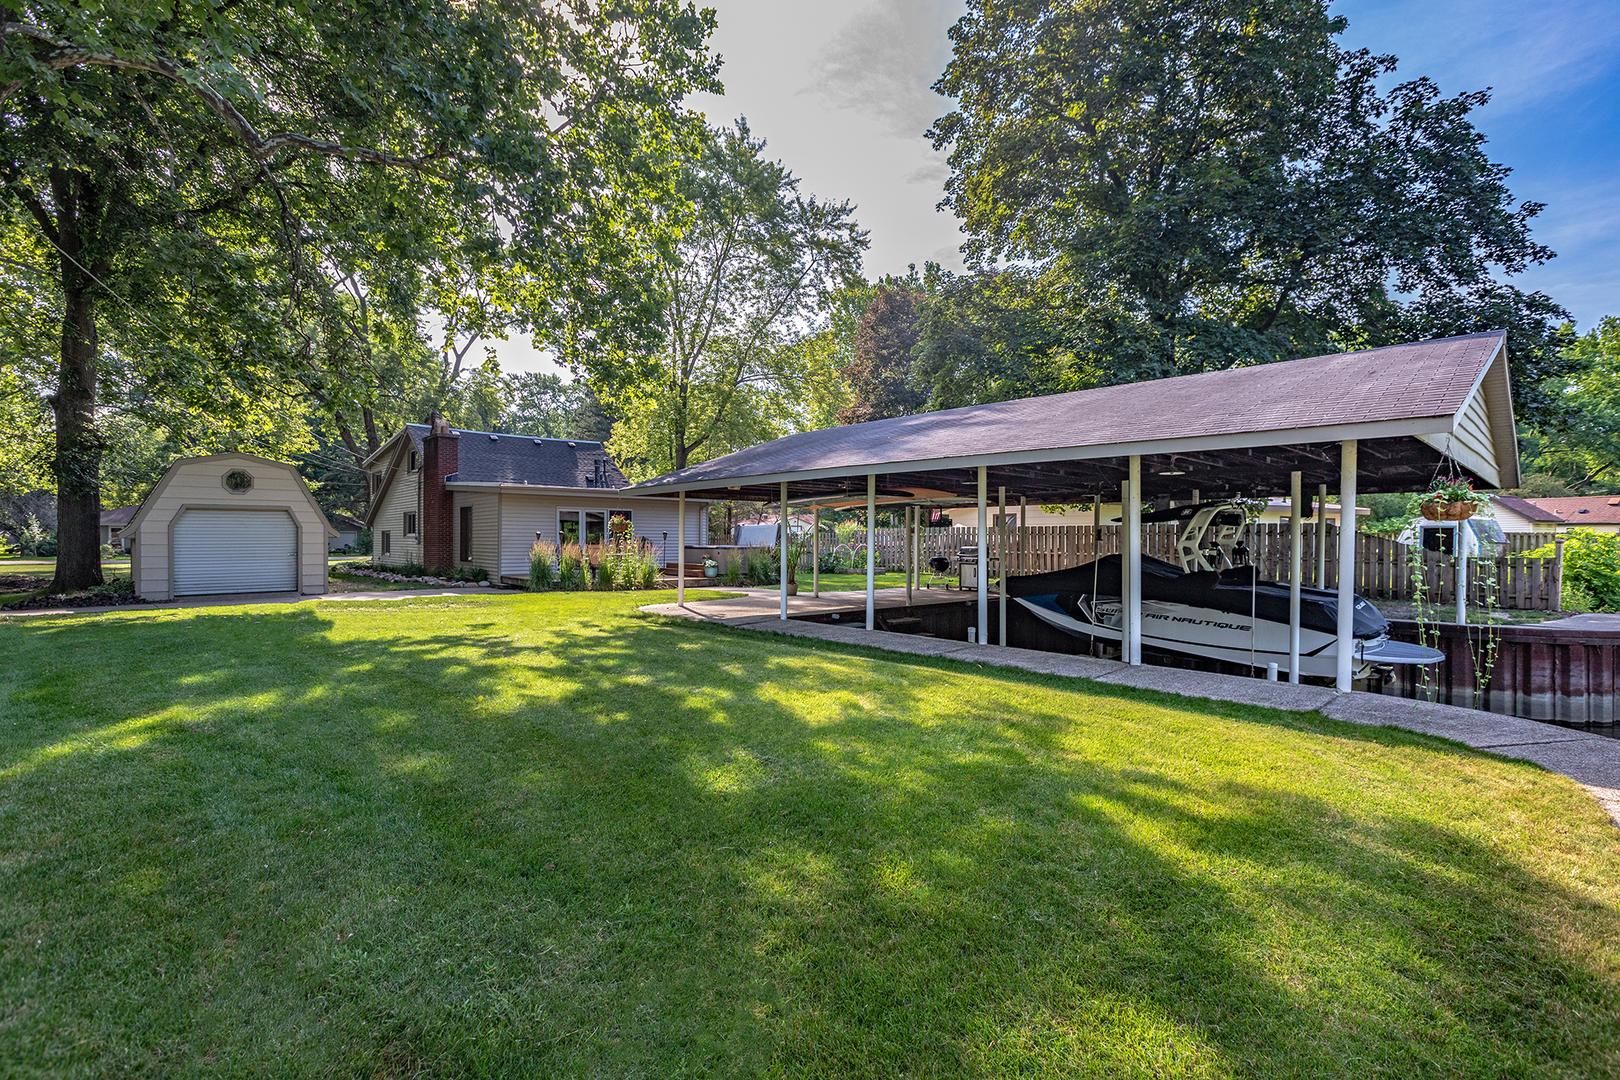 9413 Byrne Drive, Fox River Grove, IL 60021